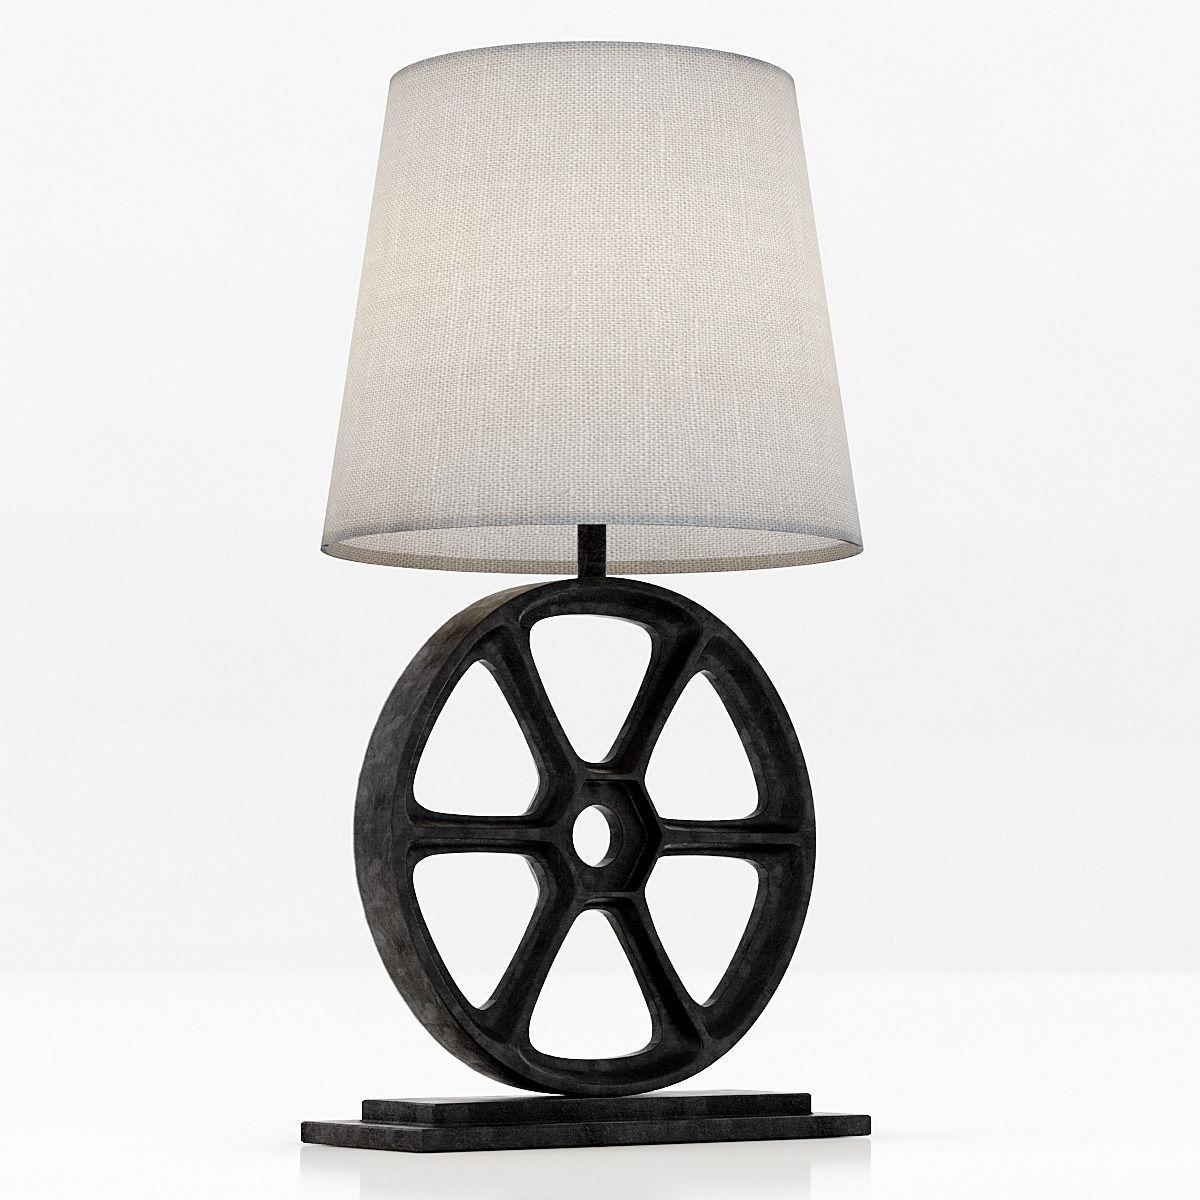 Restoration Hardware Lighting Table Lamps Emil Metal